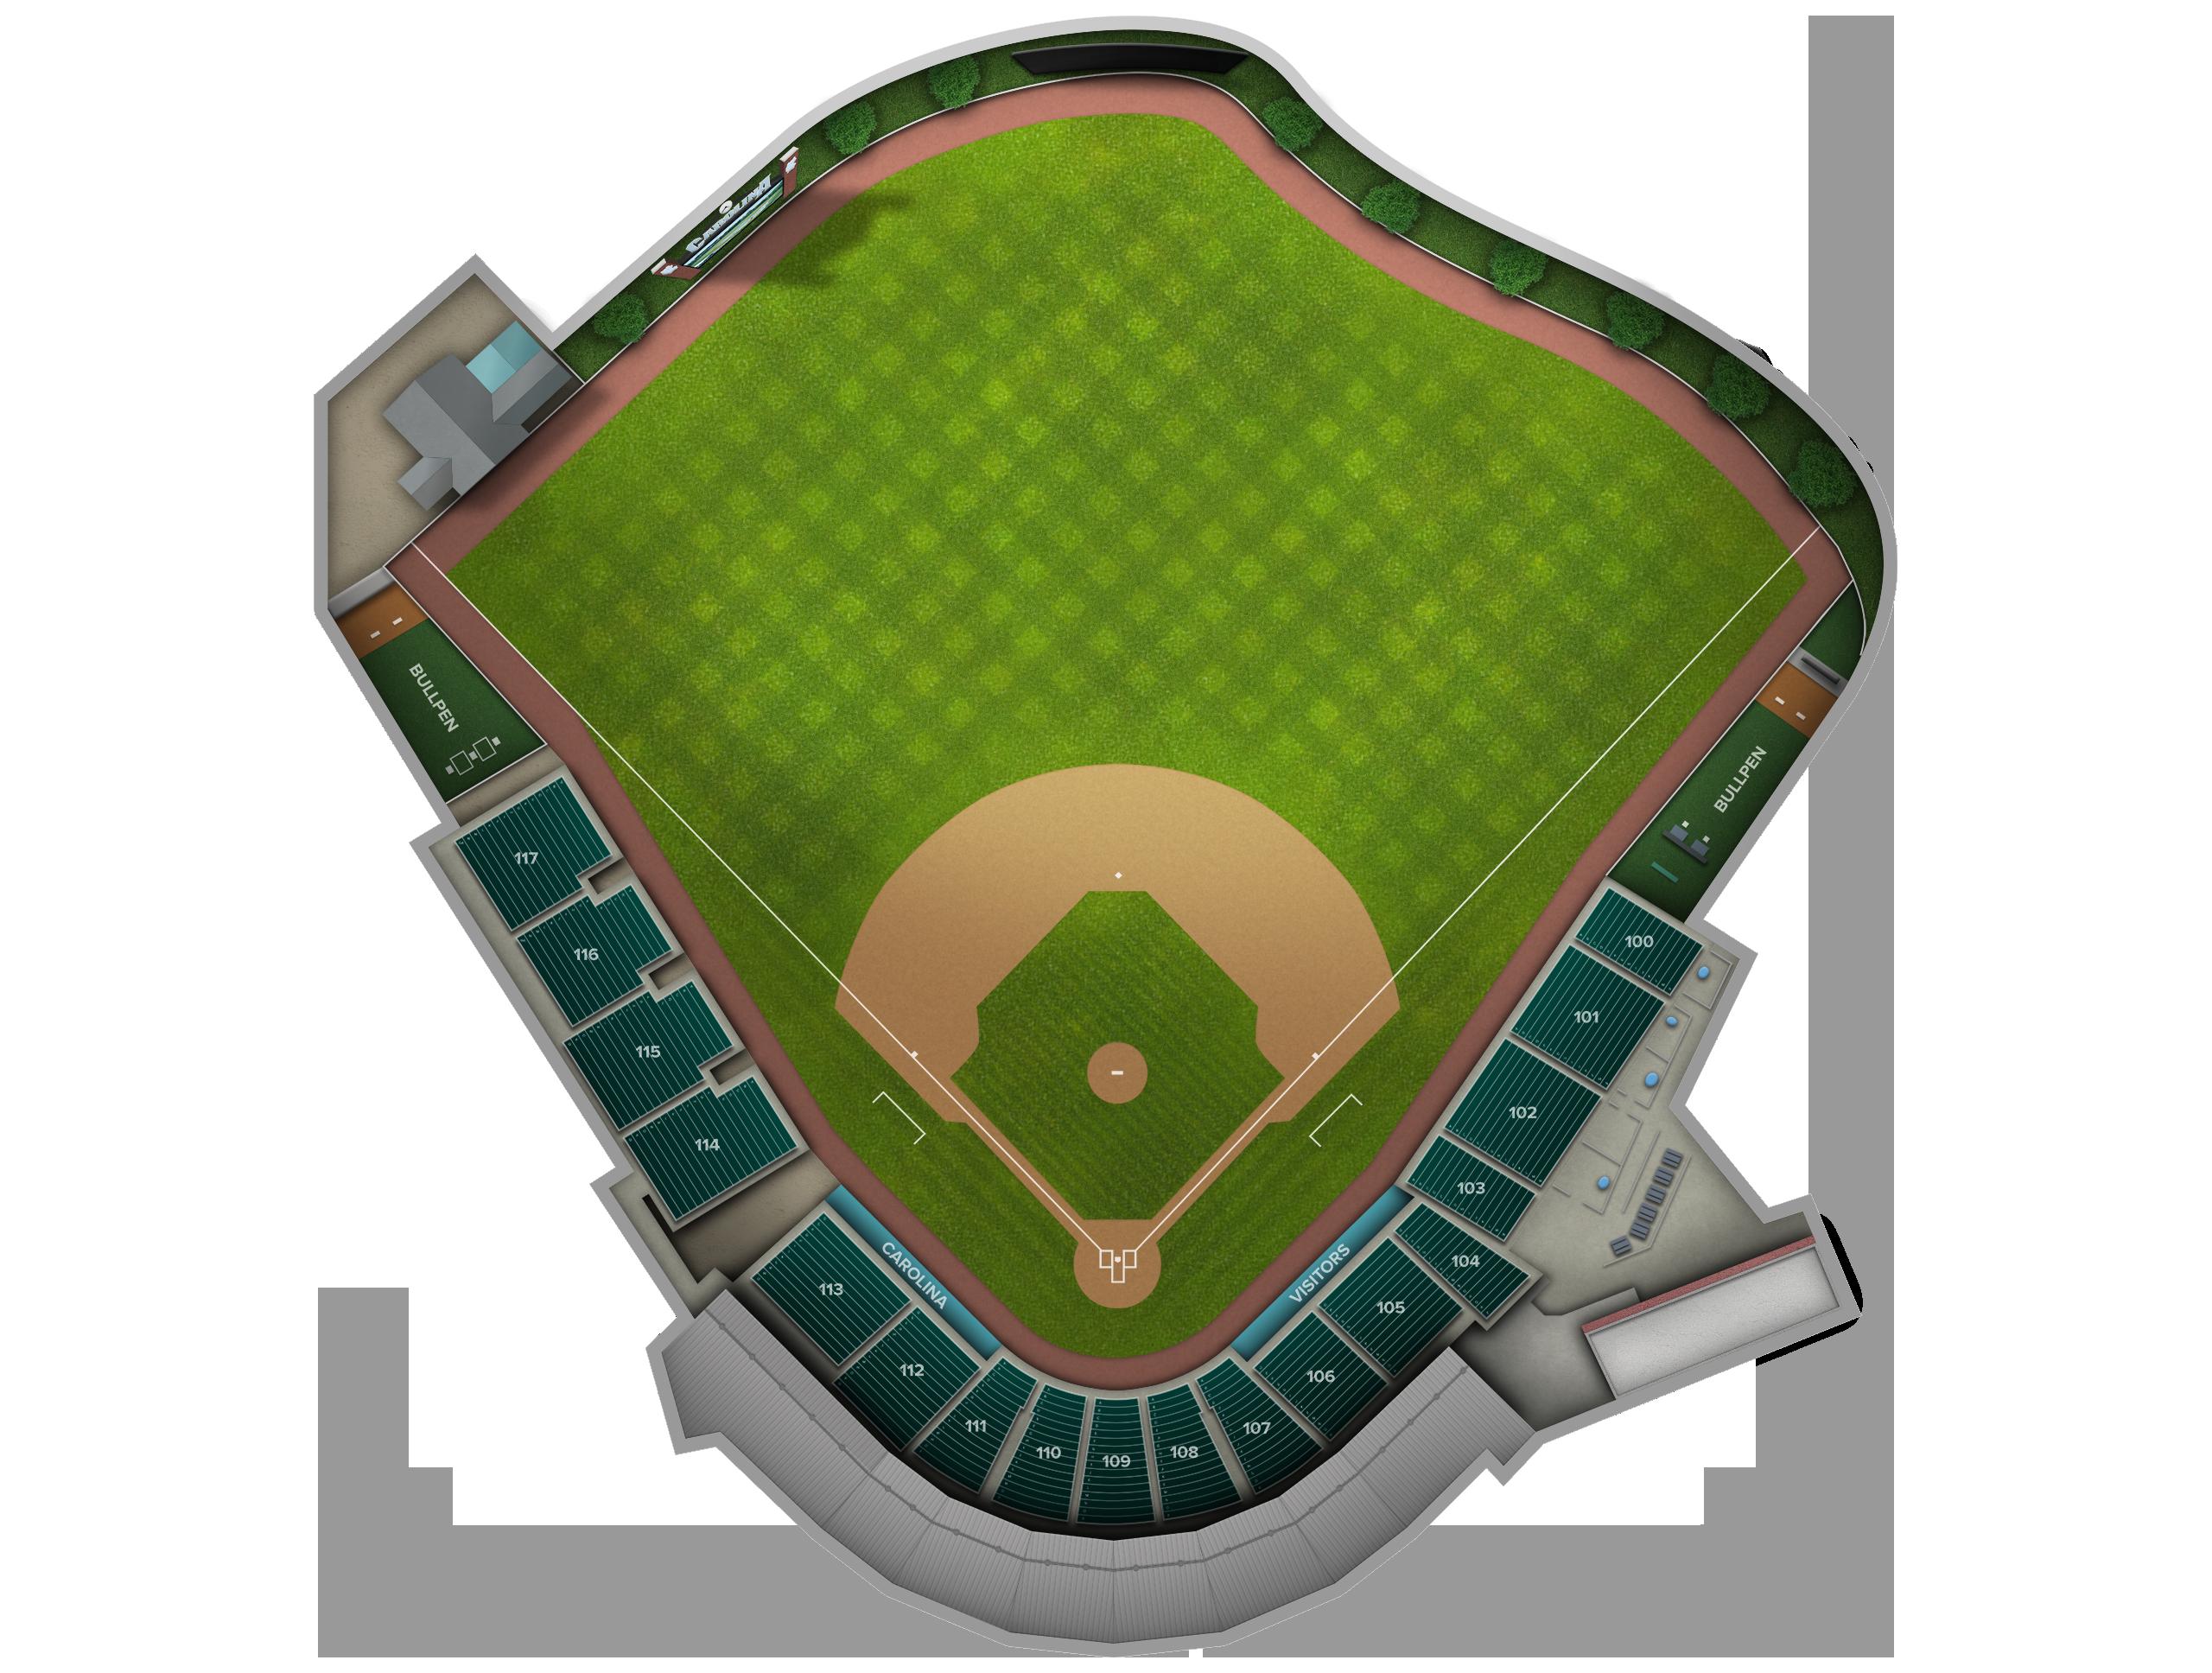 unc baseball stadium seating chart - The future